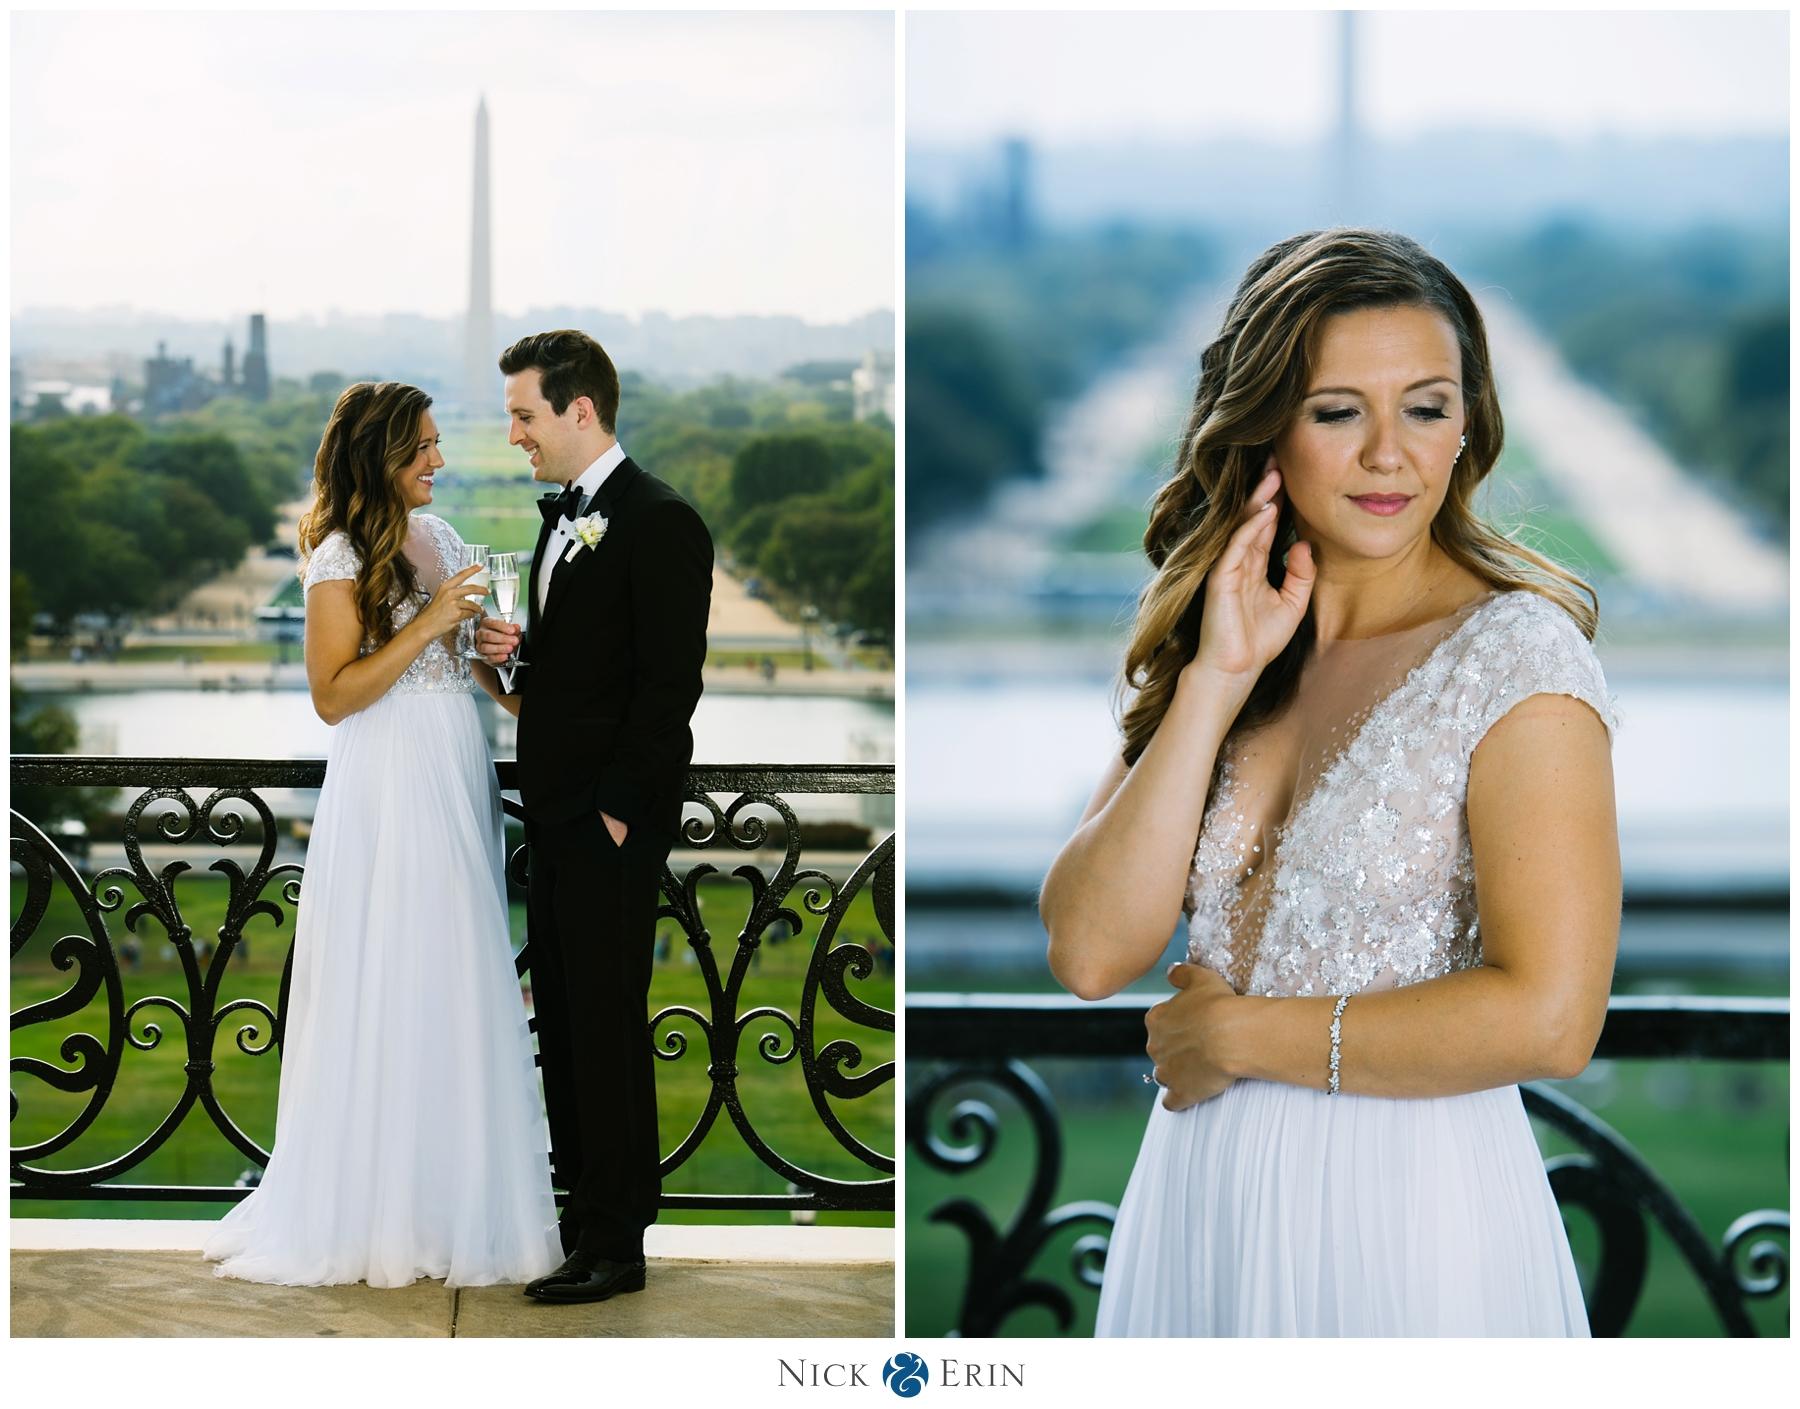 donner_photography_washington-dc-wedding_ariel-patrick_0010